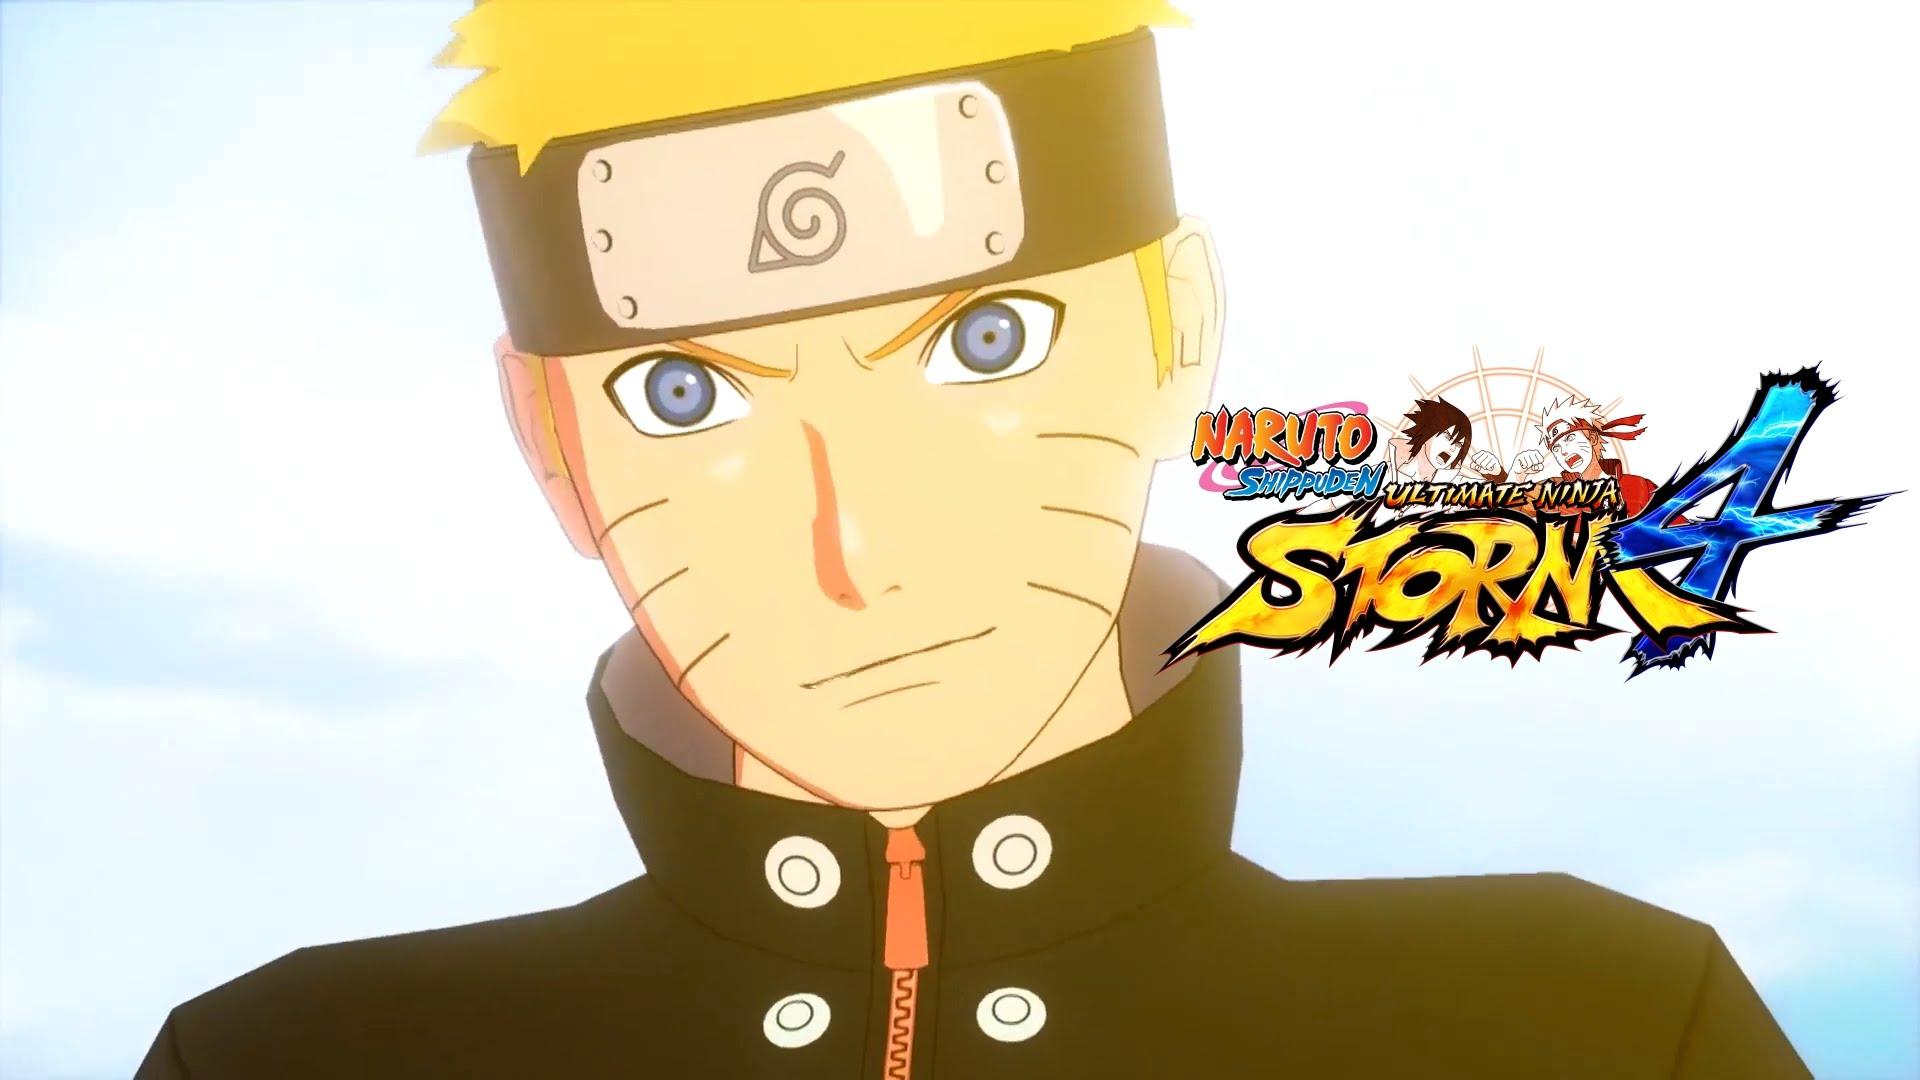 Free Download Naruto Shippuden Ultimate Ninja Storm 4 Hd Wallpaper